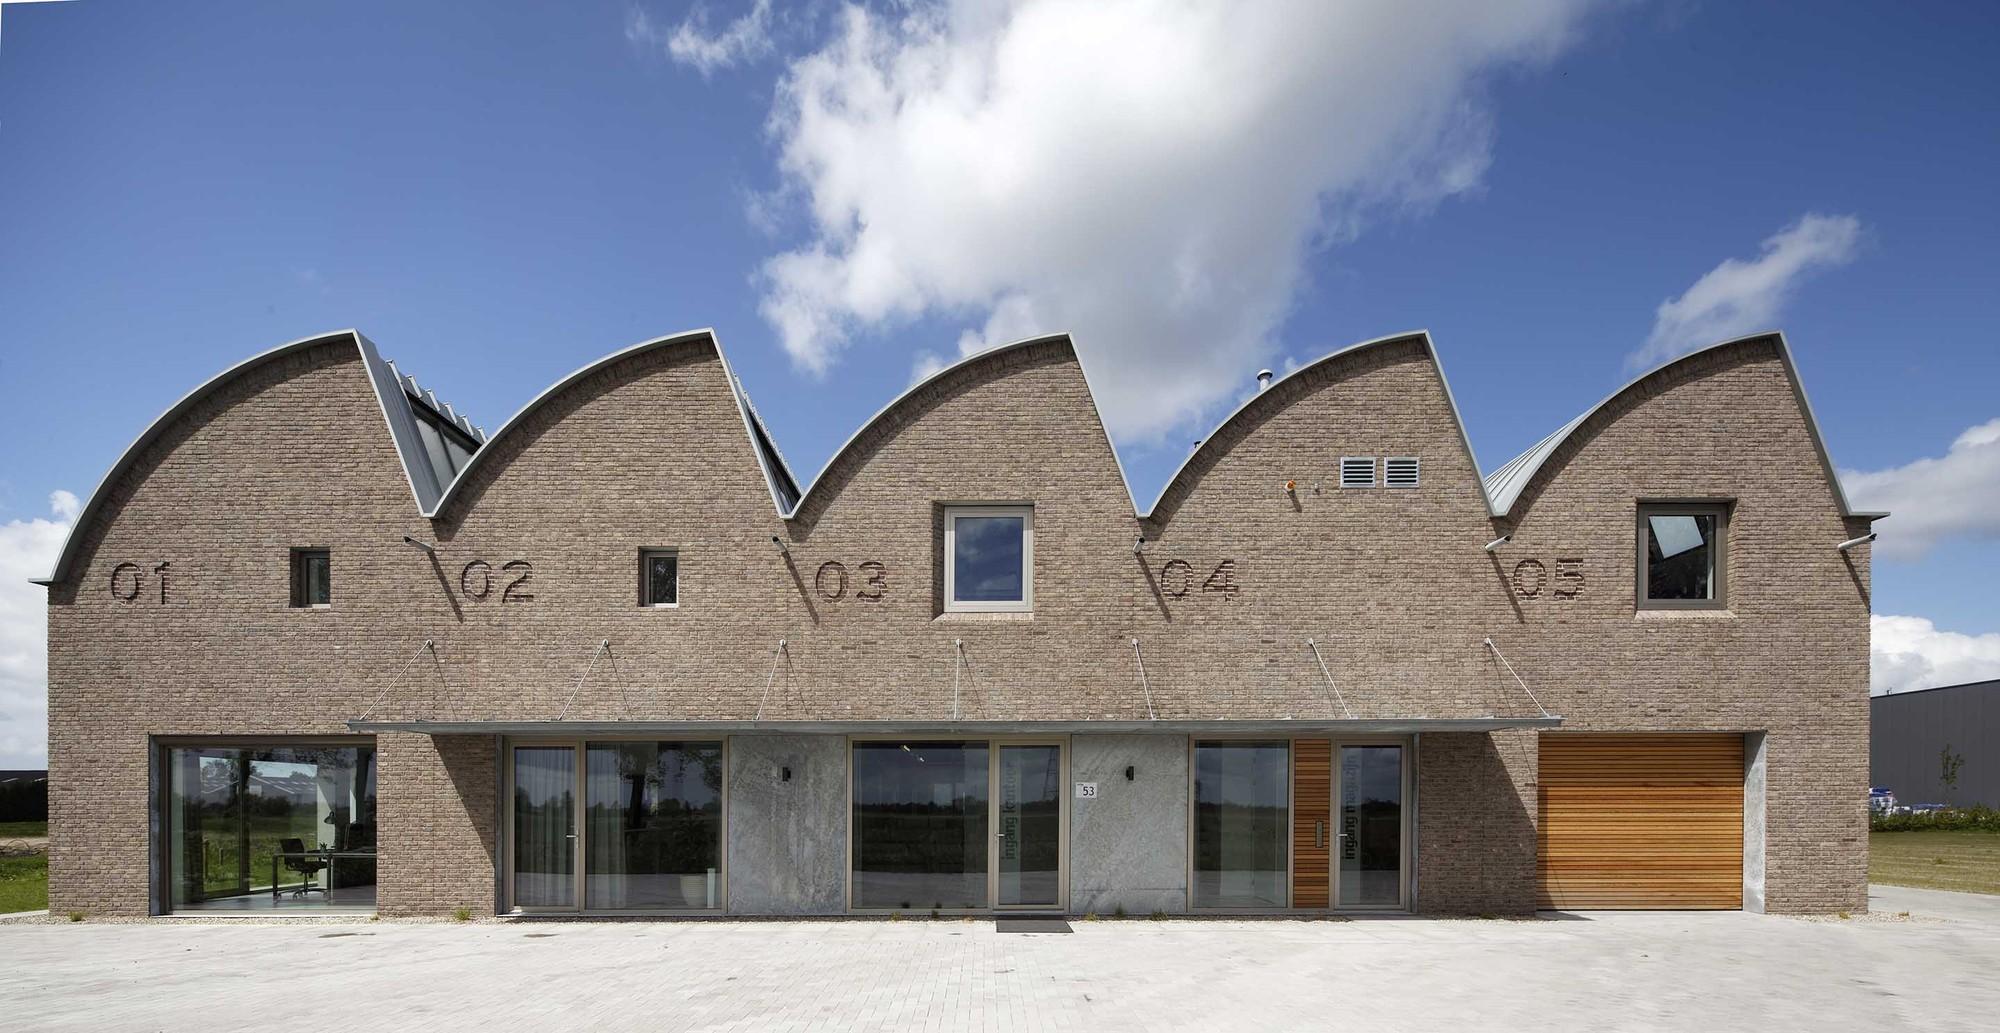 Office Building ForTop / Arnoud Olie, © René de Wit